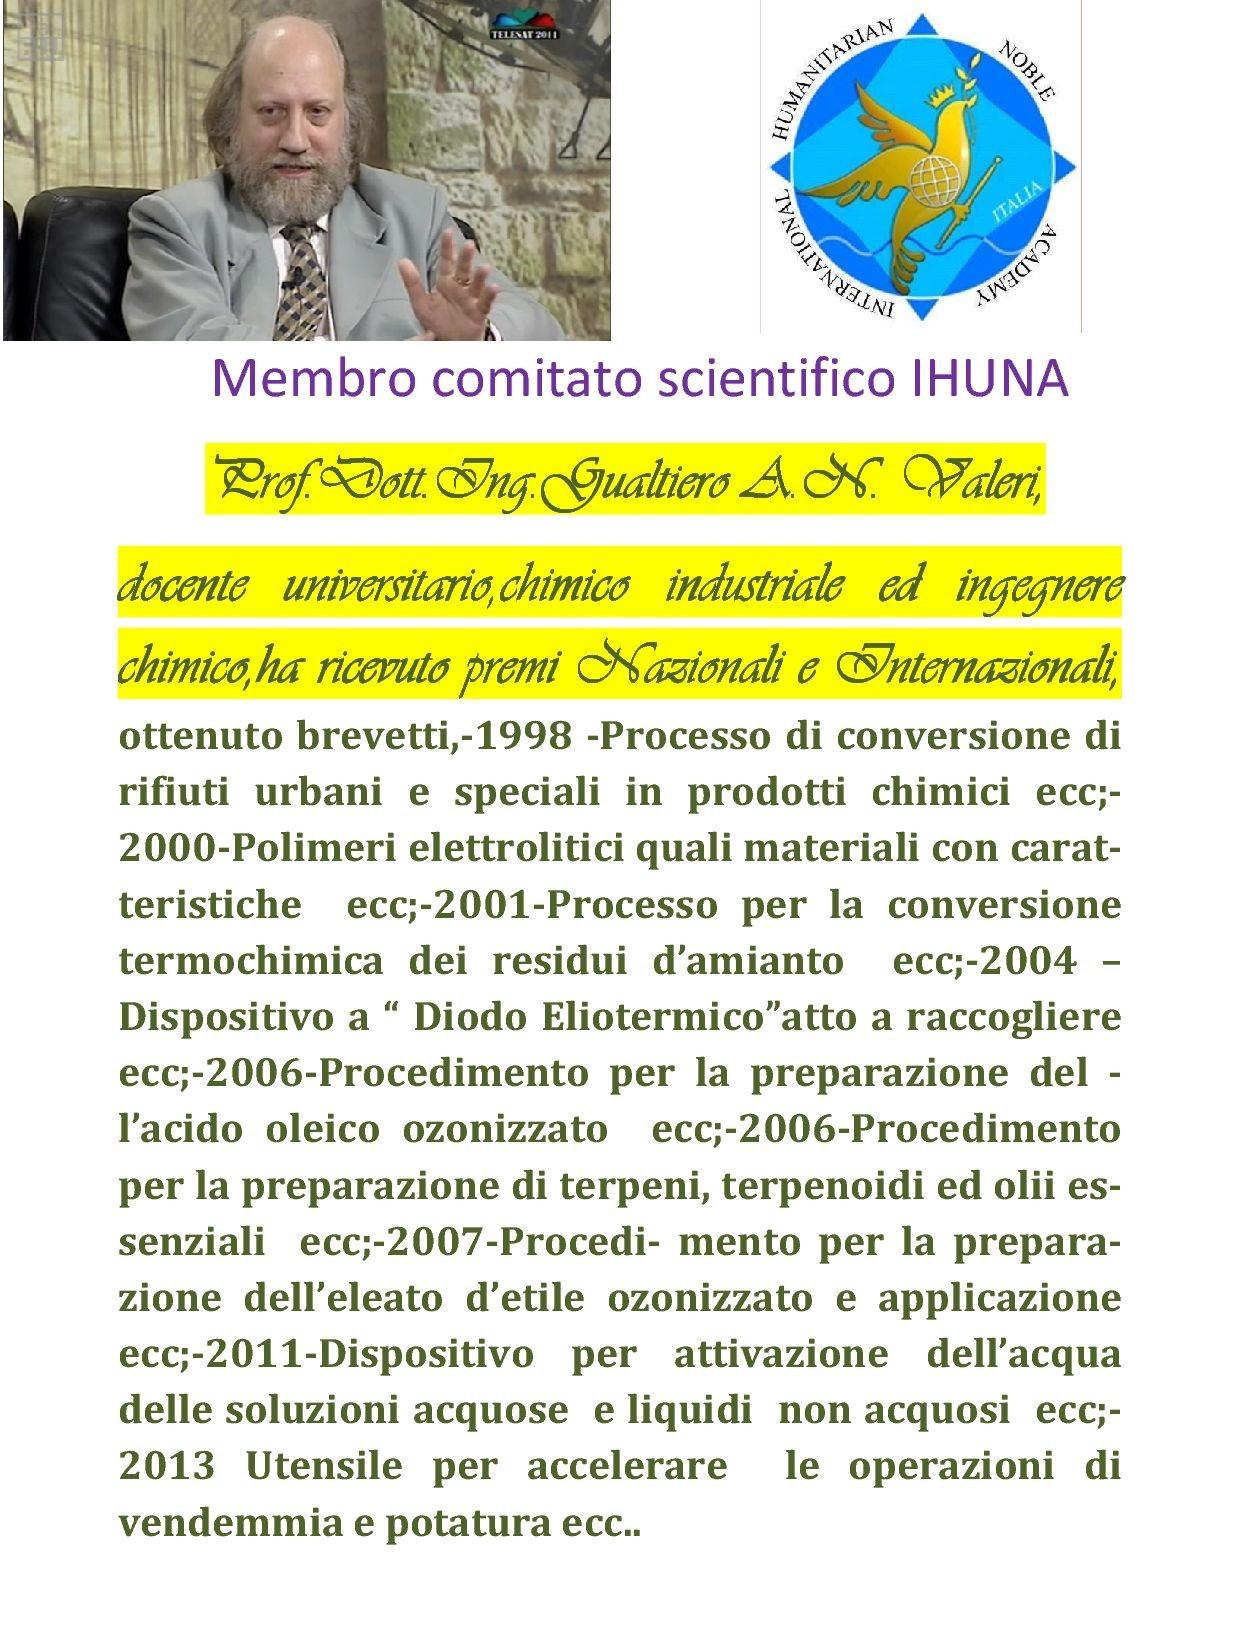 Prof. Dott. Ing. Gualtiero A. N. Valeri